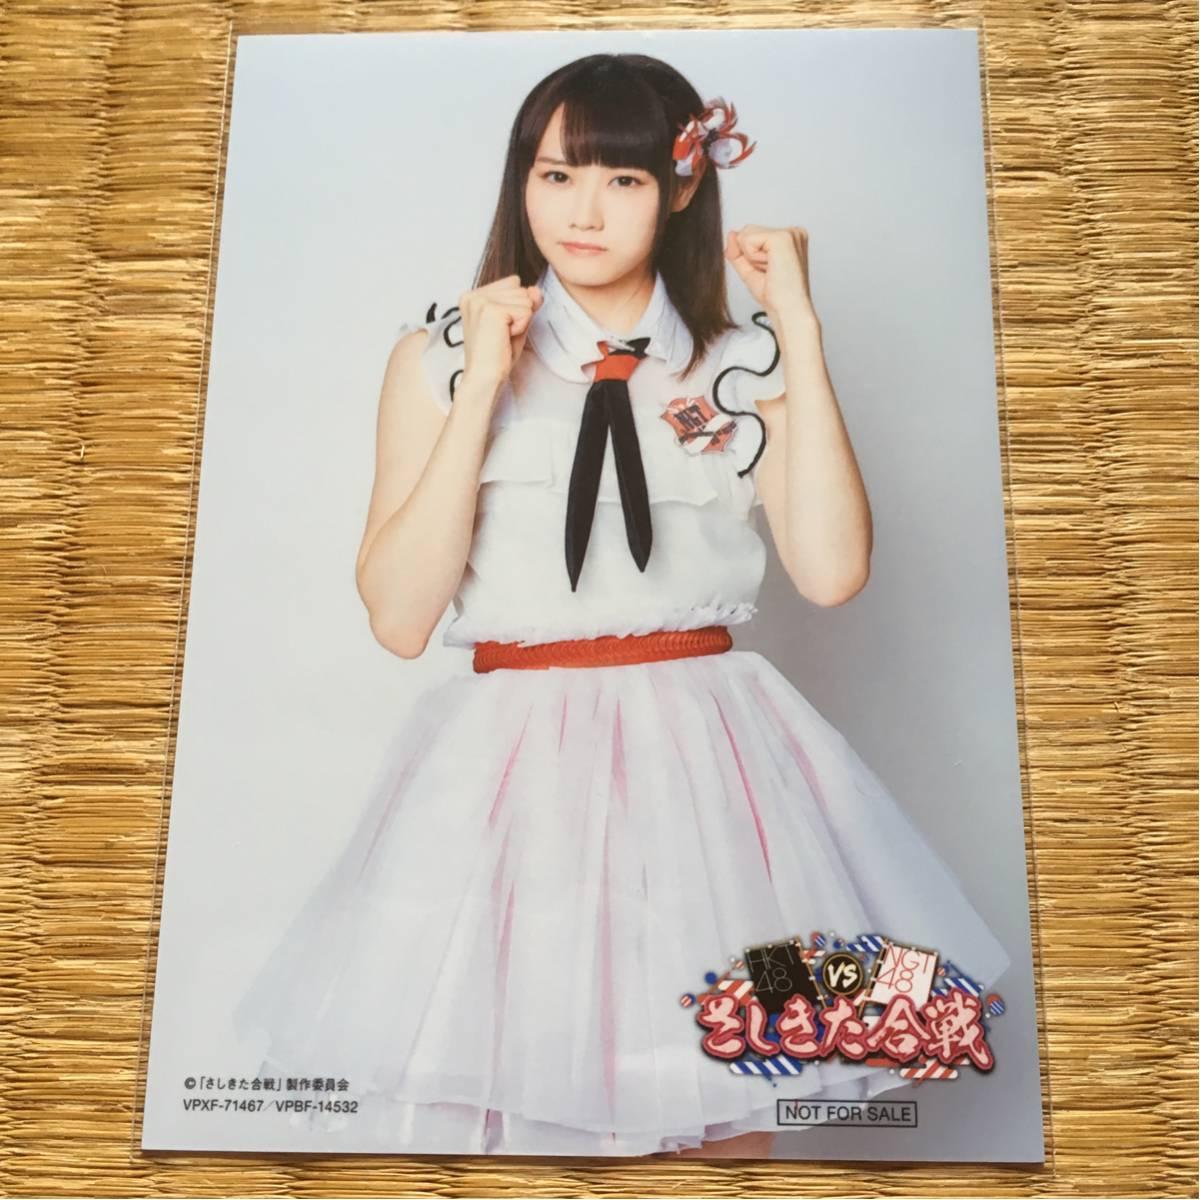 NGT48 西潟茉莉奈 生写真 さしきた合戦DVD特典 ライブグッズの画像